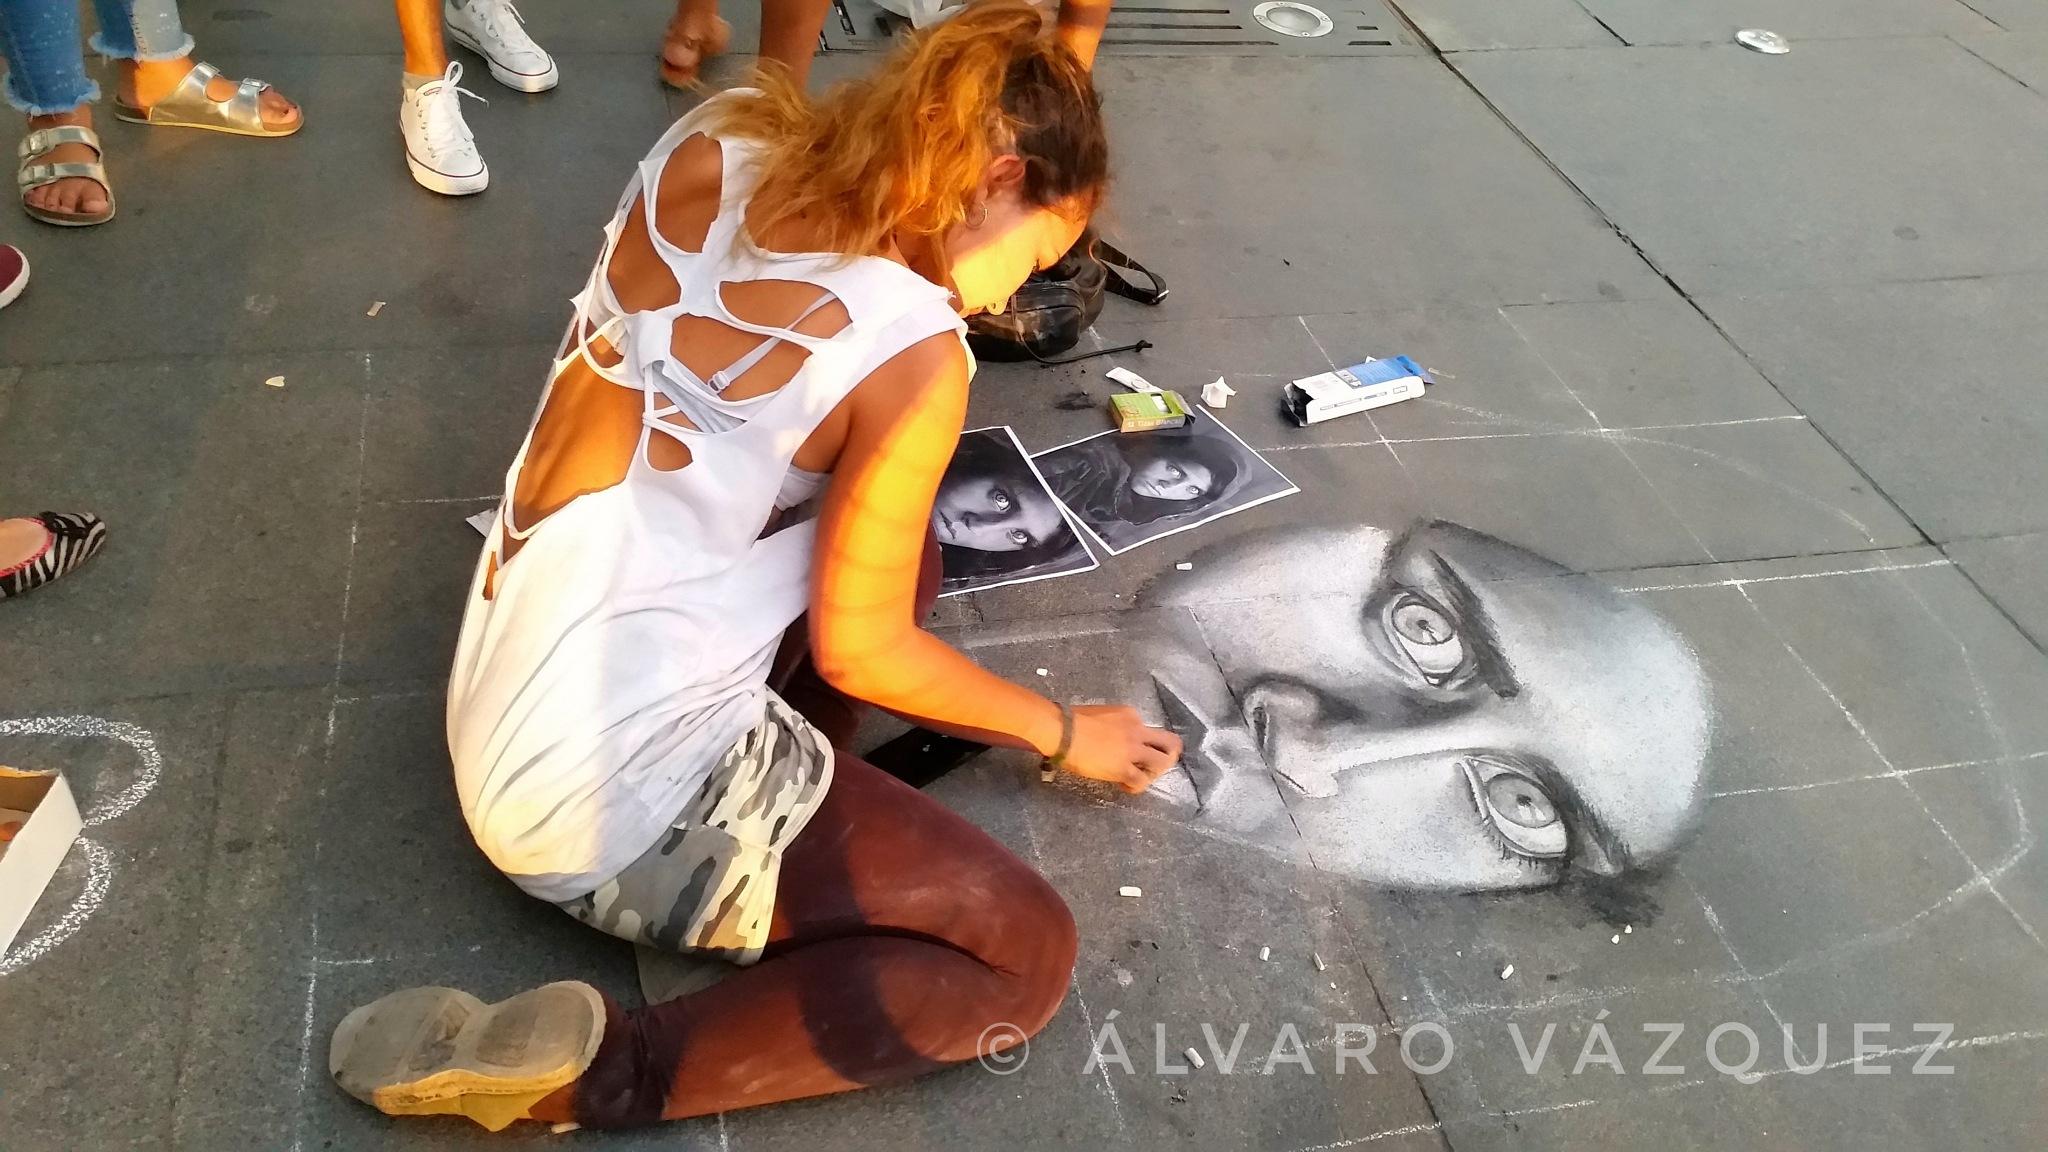 Streetart in Seville by Álvaro Vázquez